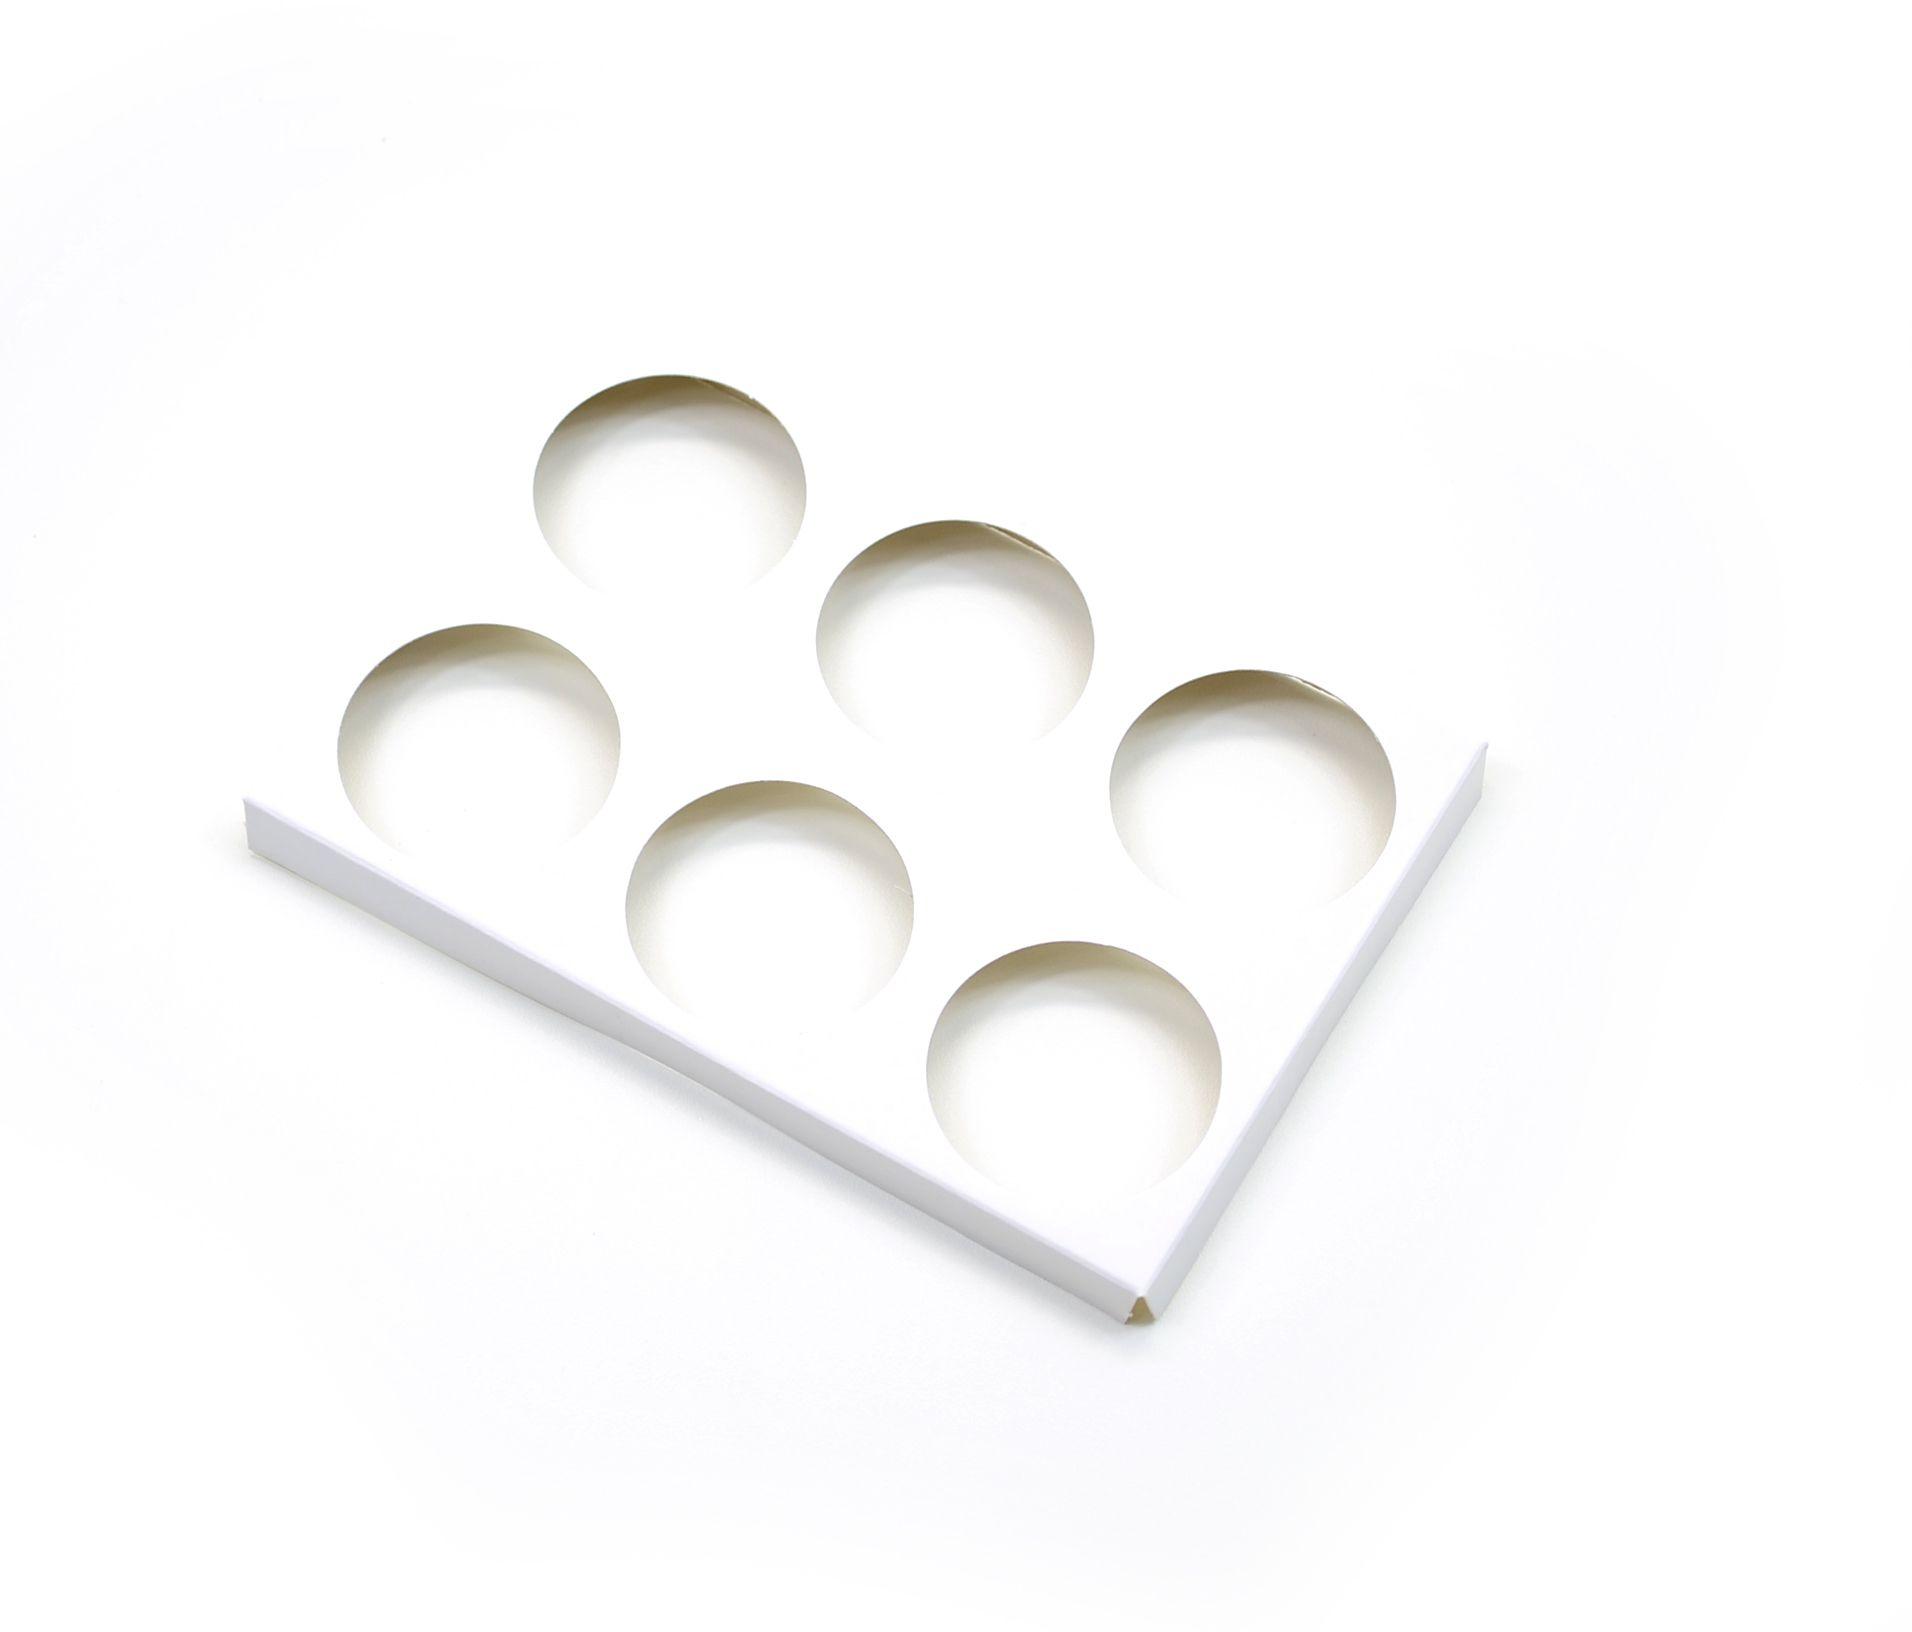 D073 Acessório p/ 6 mini cupcakes - 15,6x10,4x1,3 cm - Branca